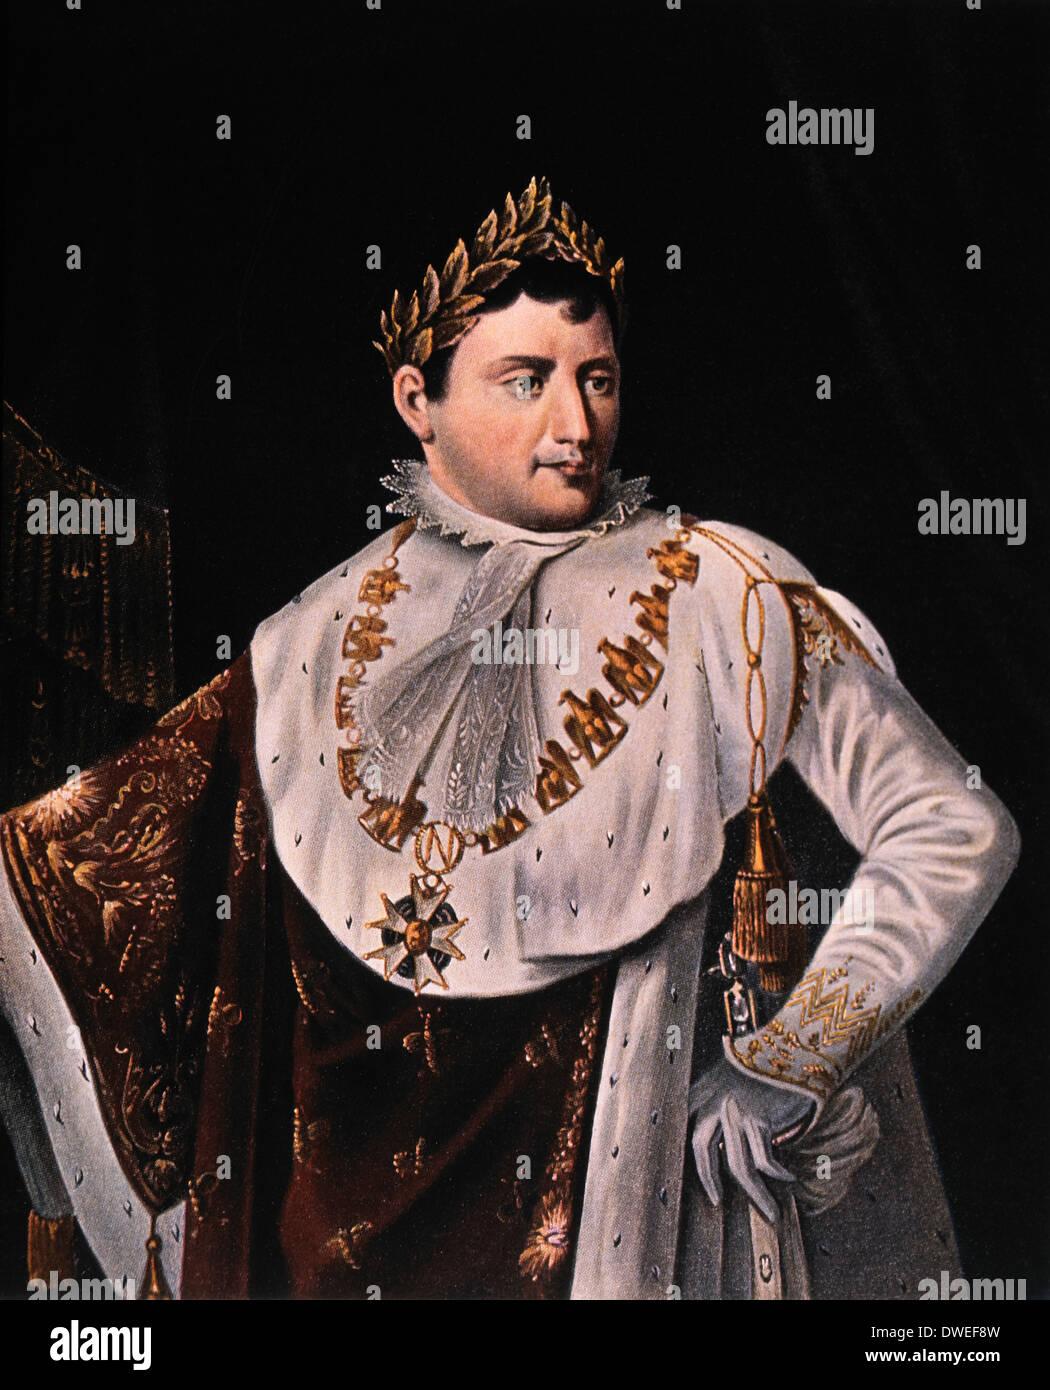 Napoleon Bonaparte (1769-1821), Emperor of France 1804-1814, Portrait - Stock Image